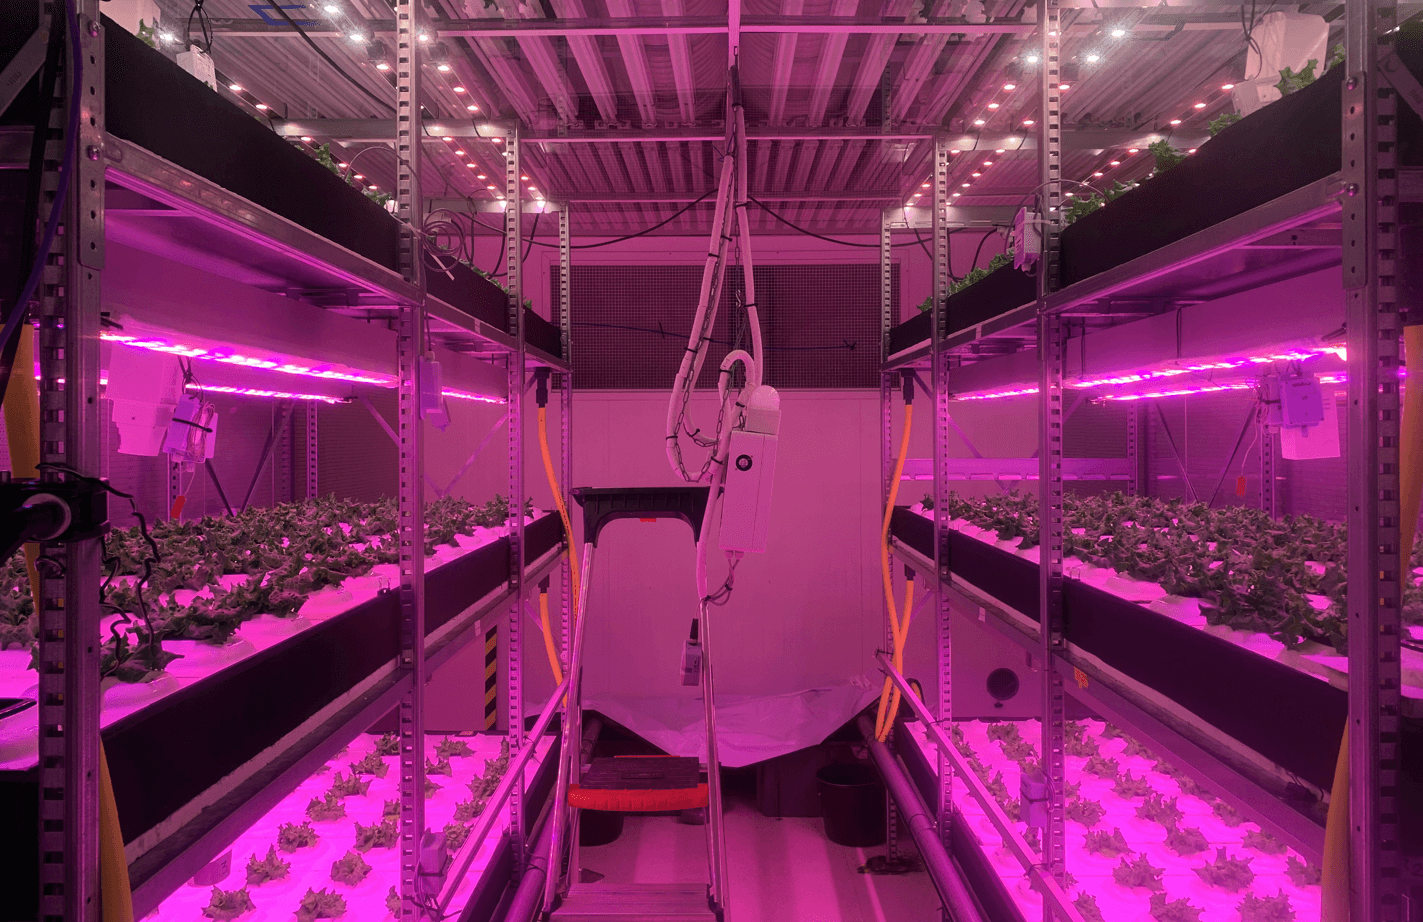 A green room with a weird, purple aura